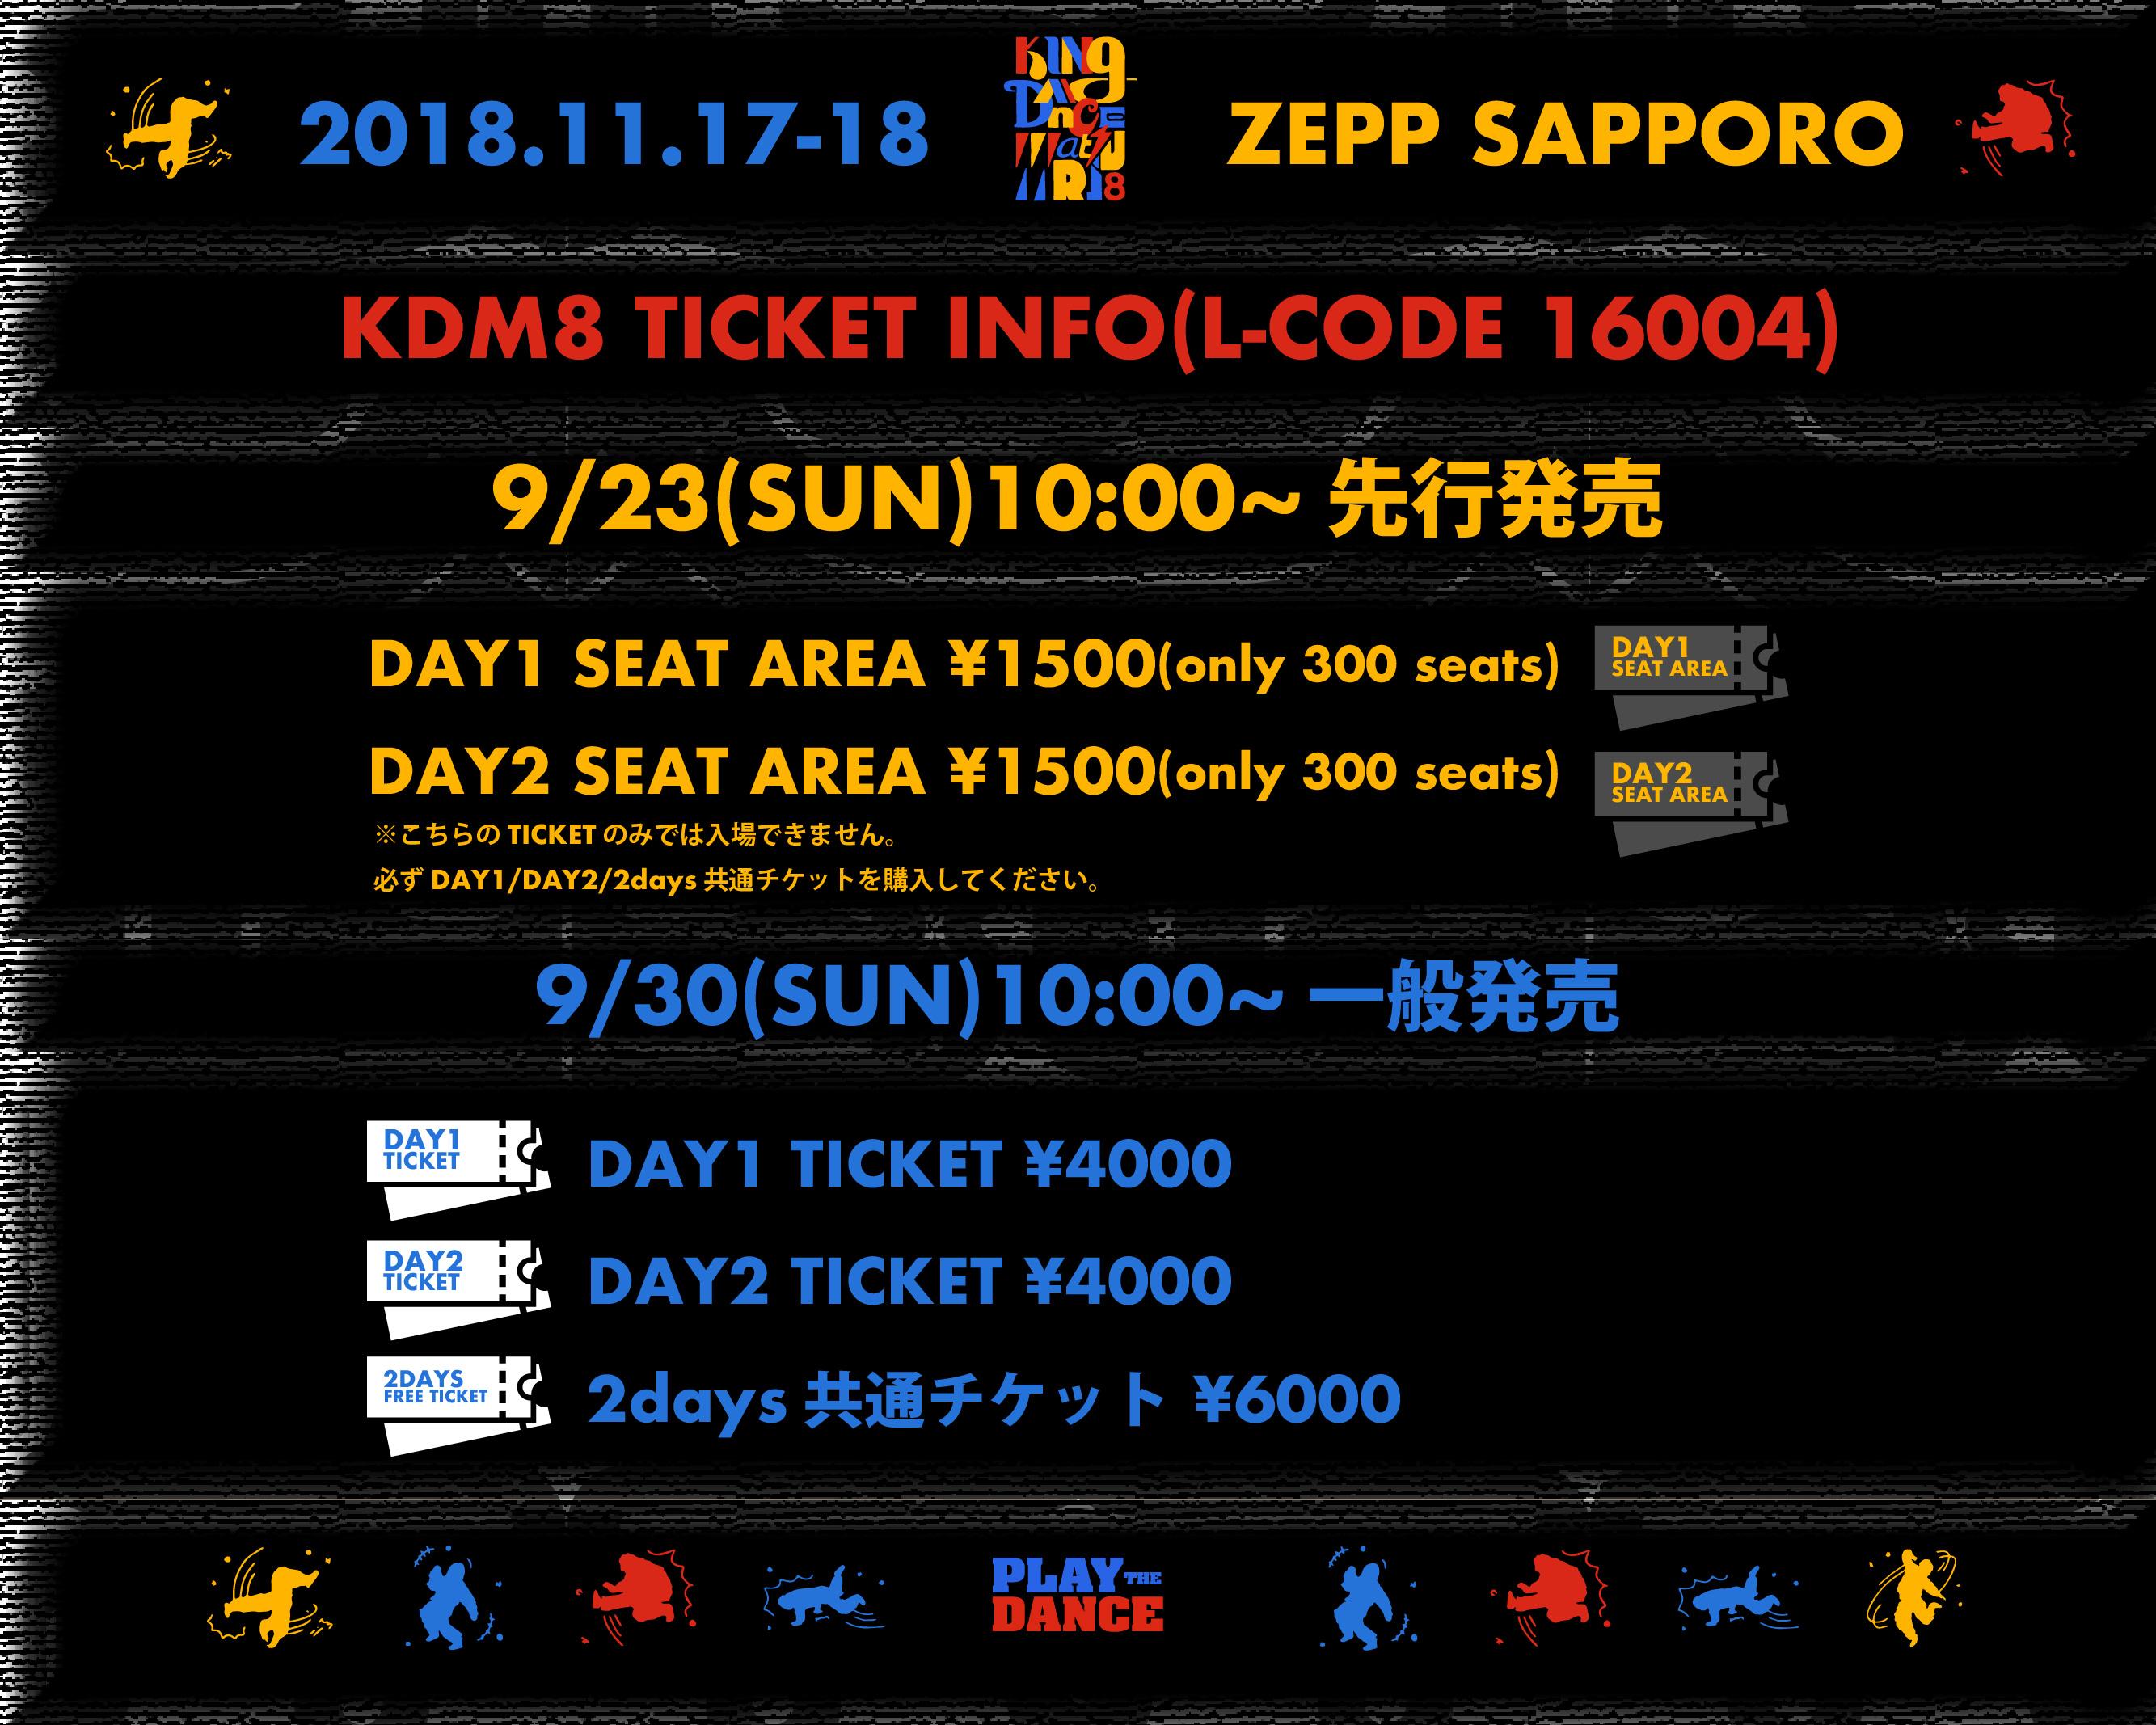 KDM8 TICKET INFO